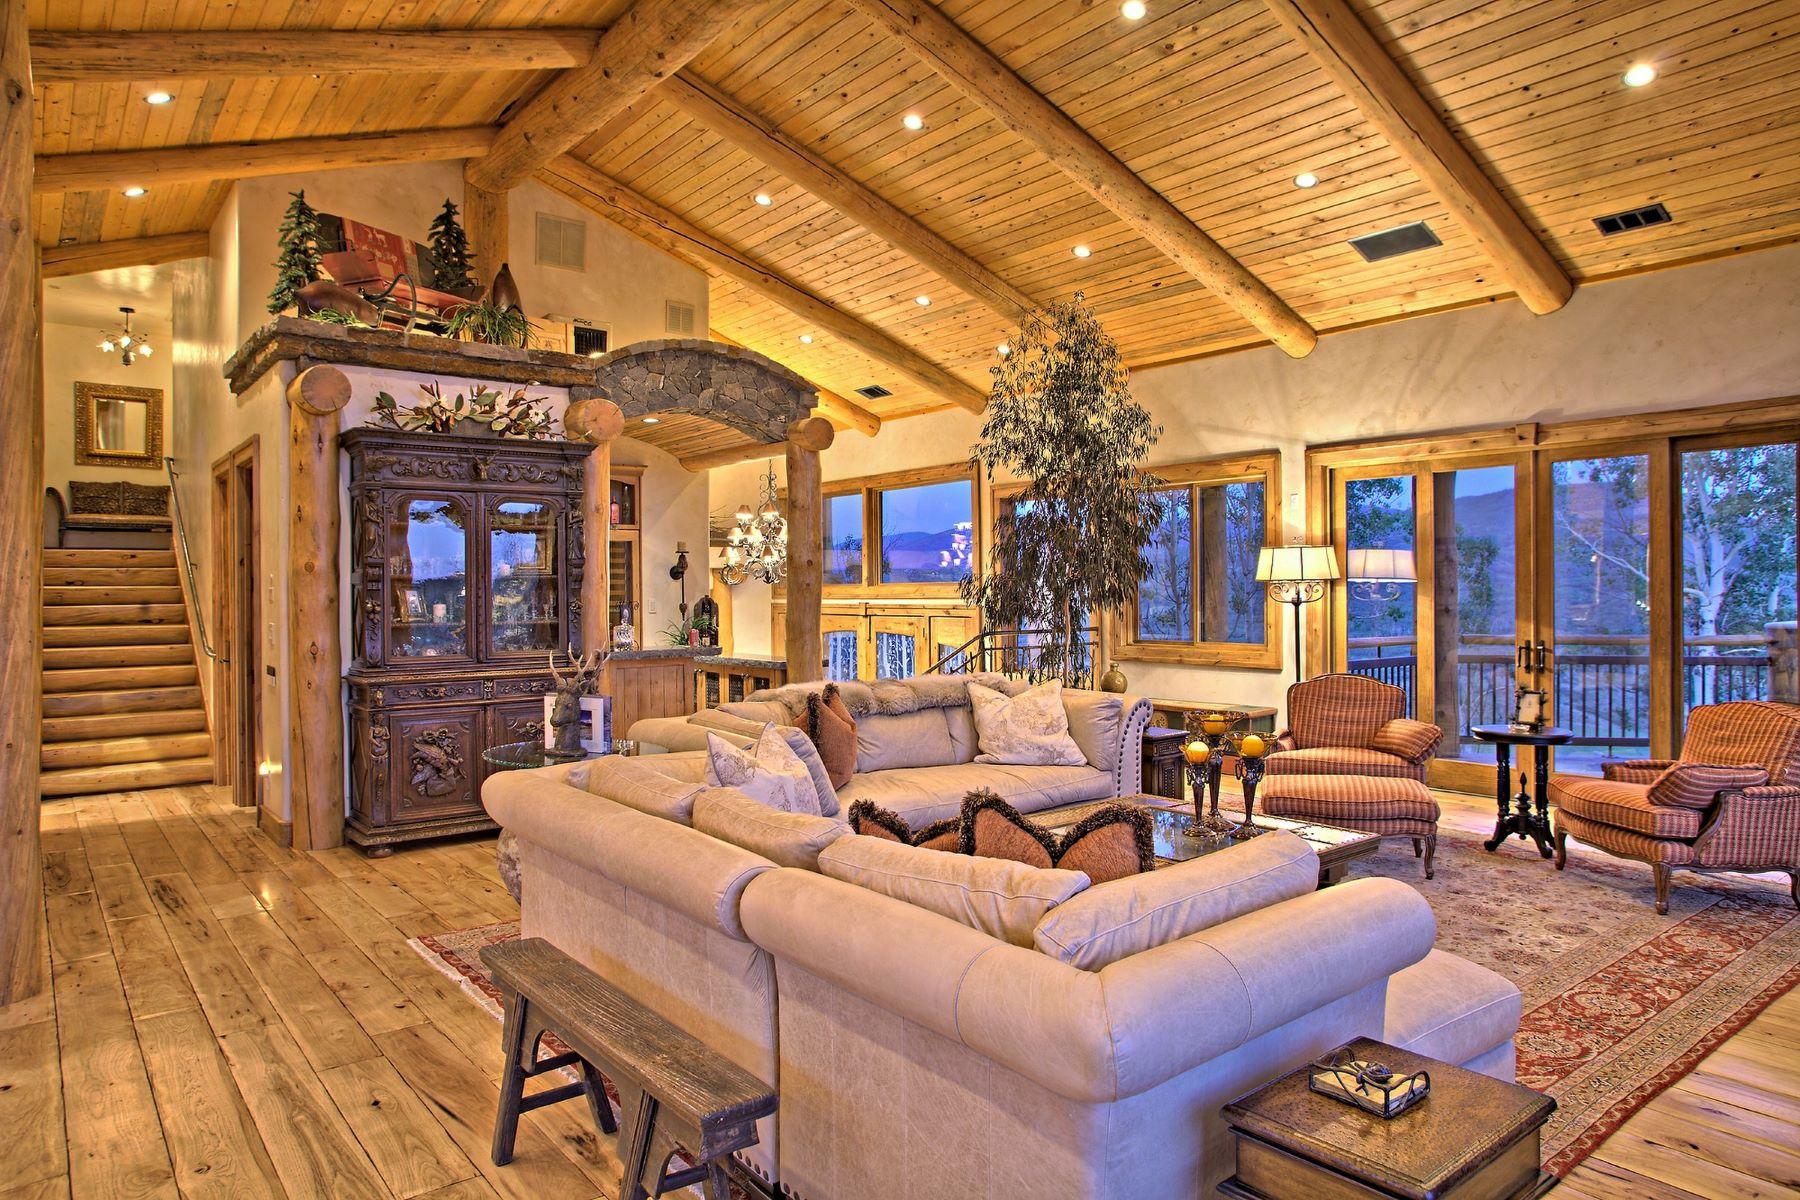 Additional photo for property listing at The Last Resort 26425 Henderson Park Road 奥克里克, 科罗拉多州 80467 美国